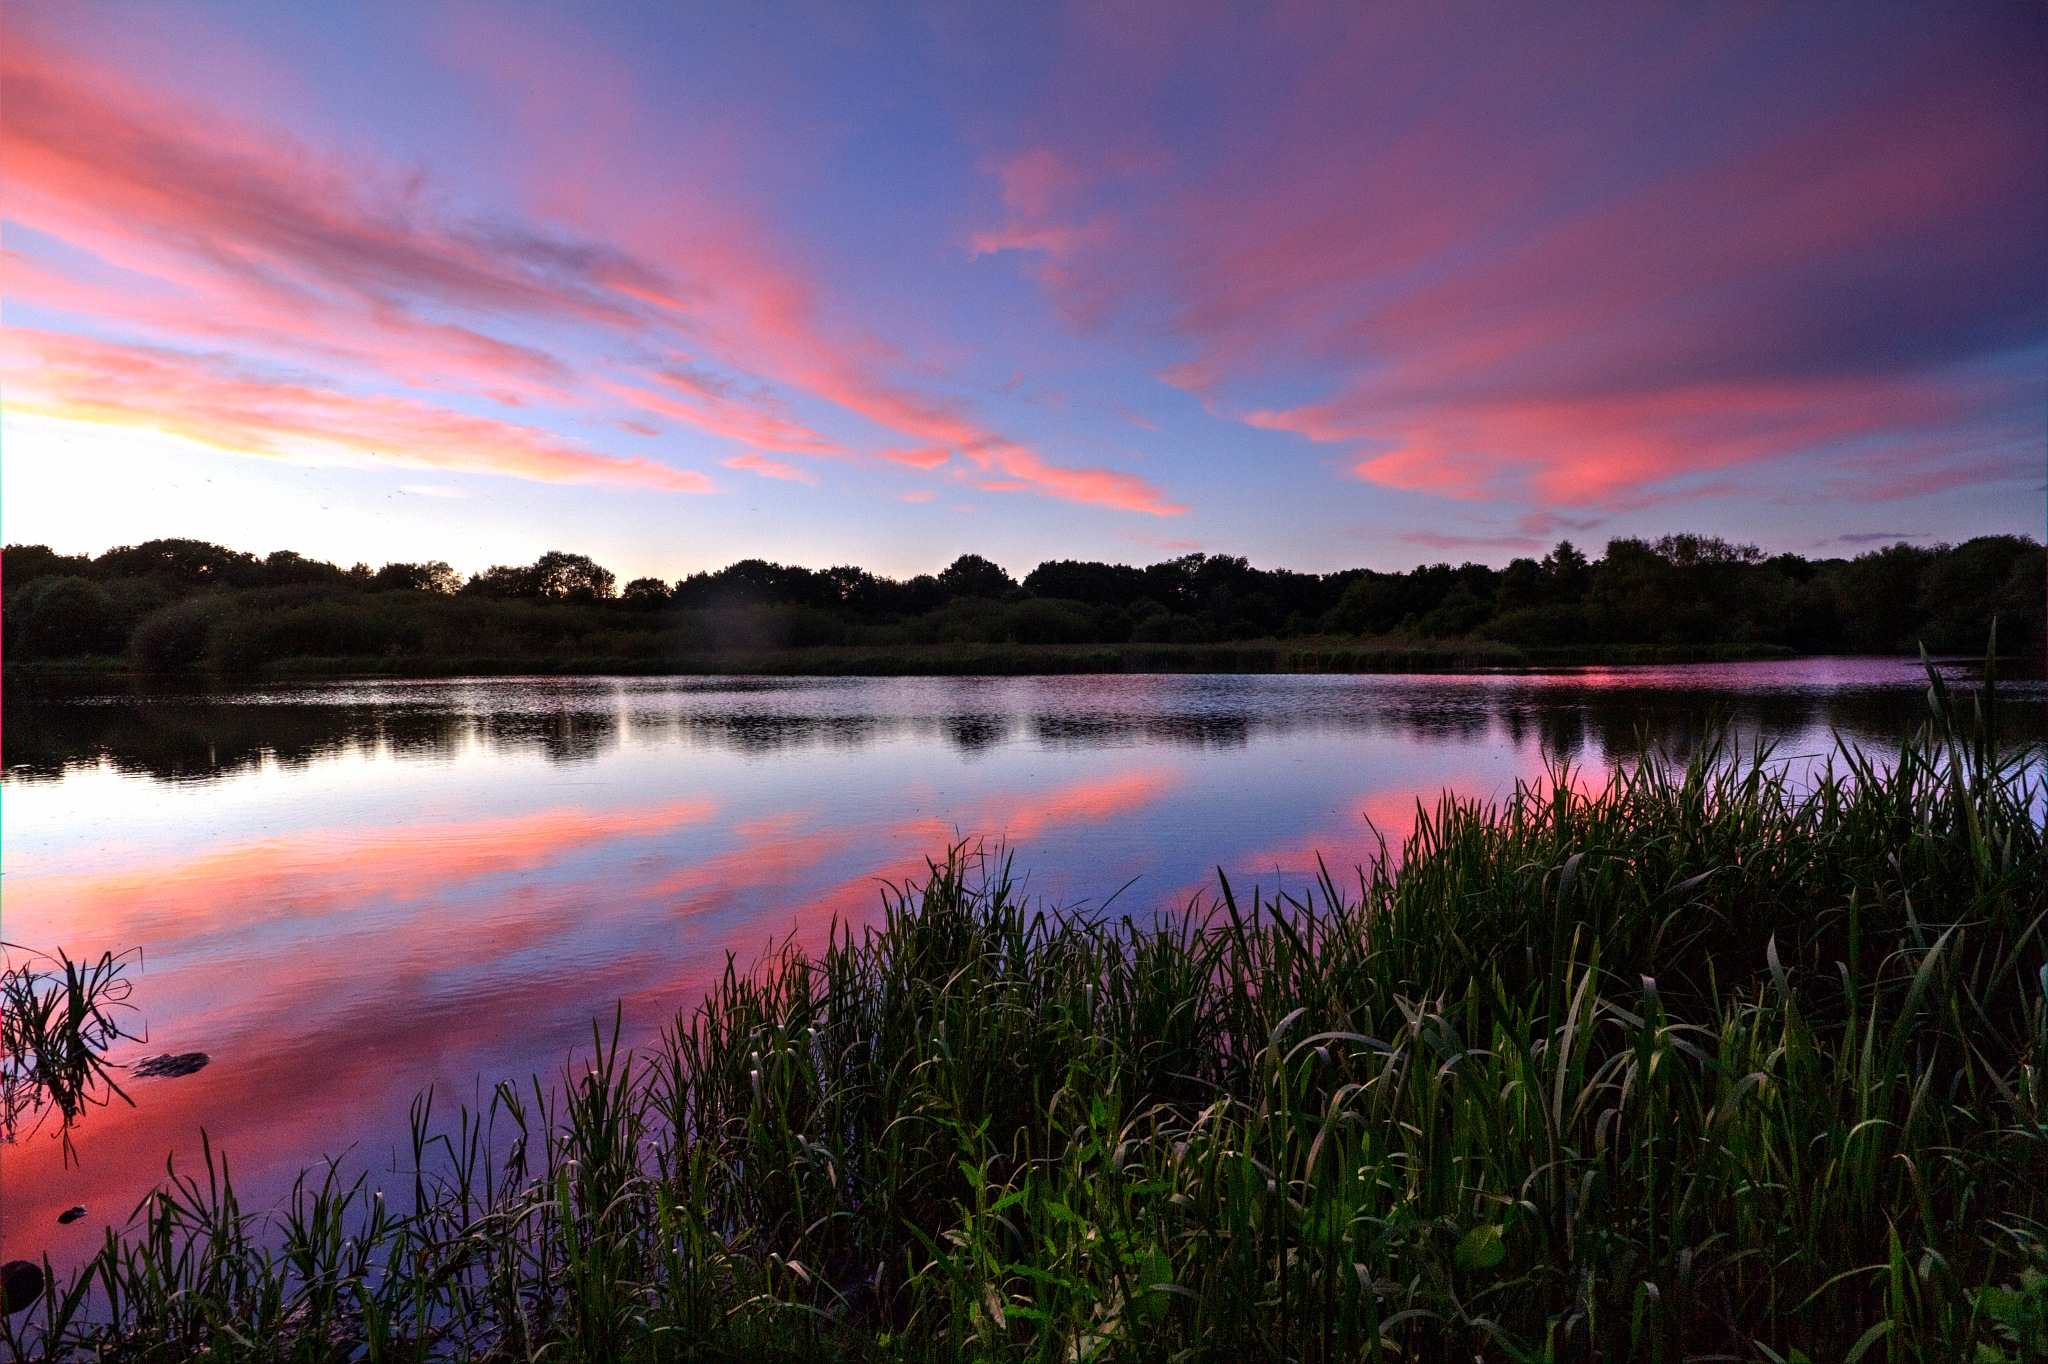 sunset over Half moon lake by Jason Lavine